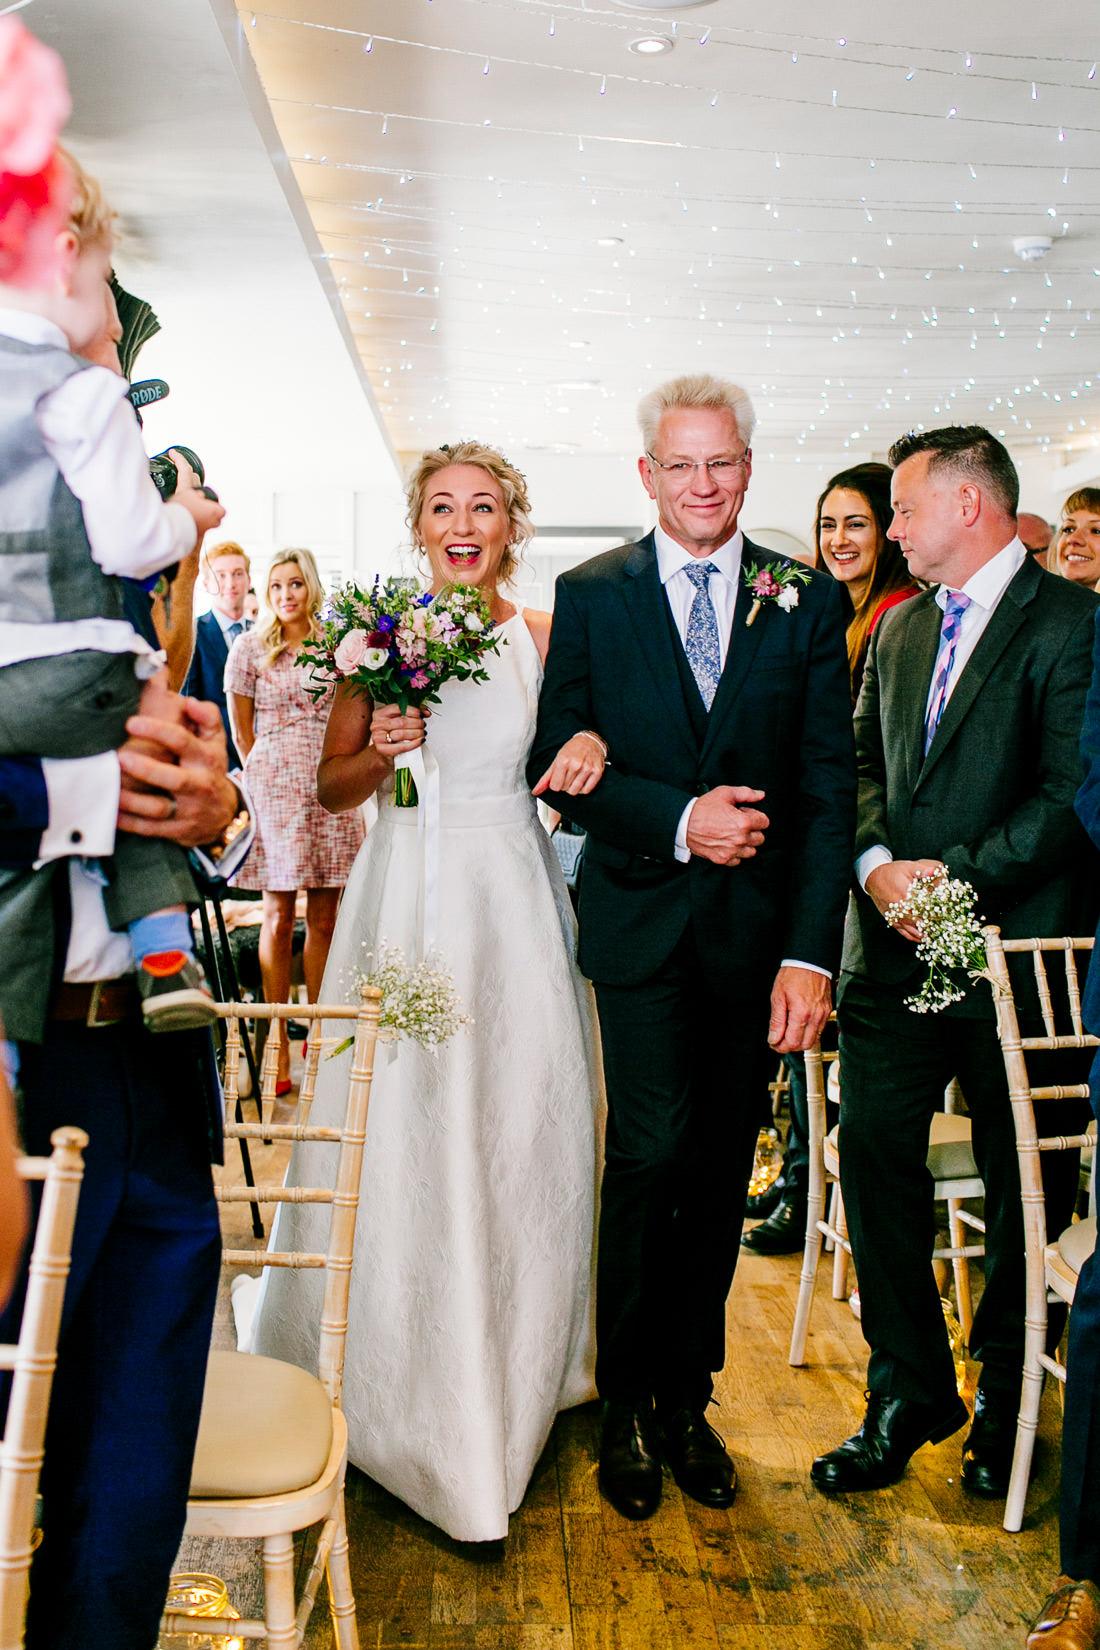 The-Gallivant-Camber-Sands-Beach-Kent-wedding-photographer-Epic-Love-Story-051